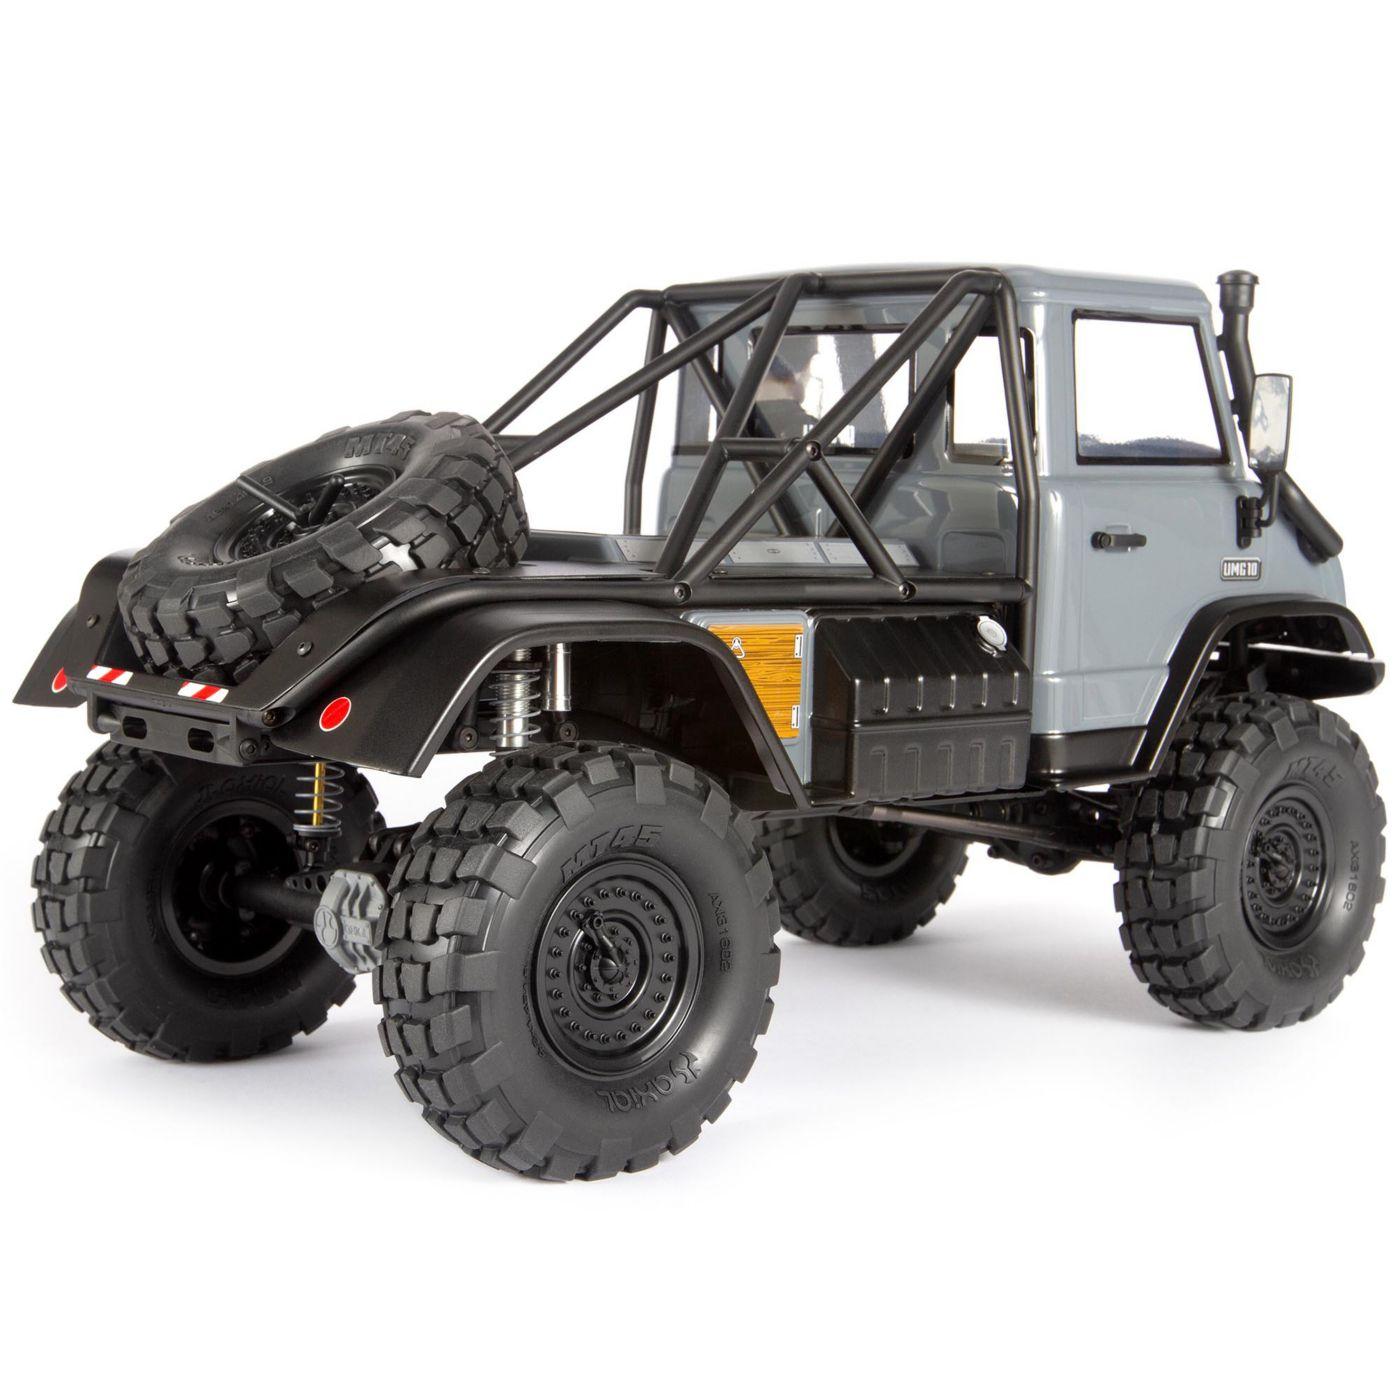 Axial SCX10 UMG10 - Rear